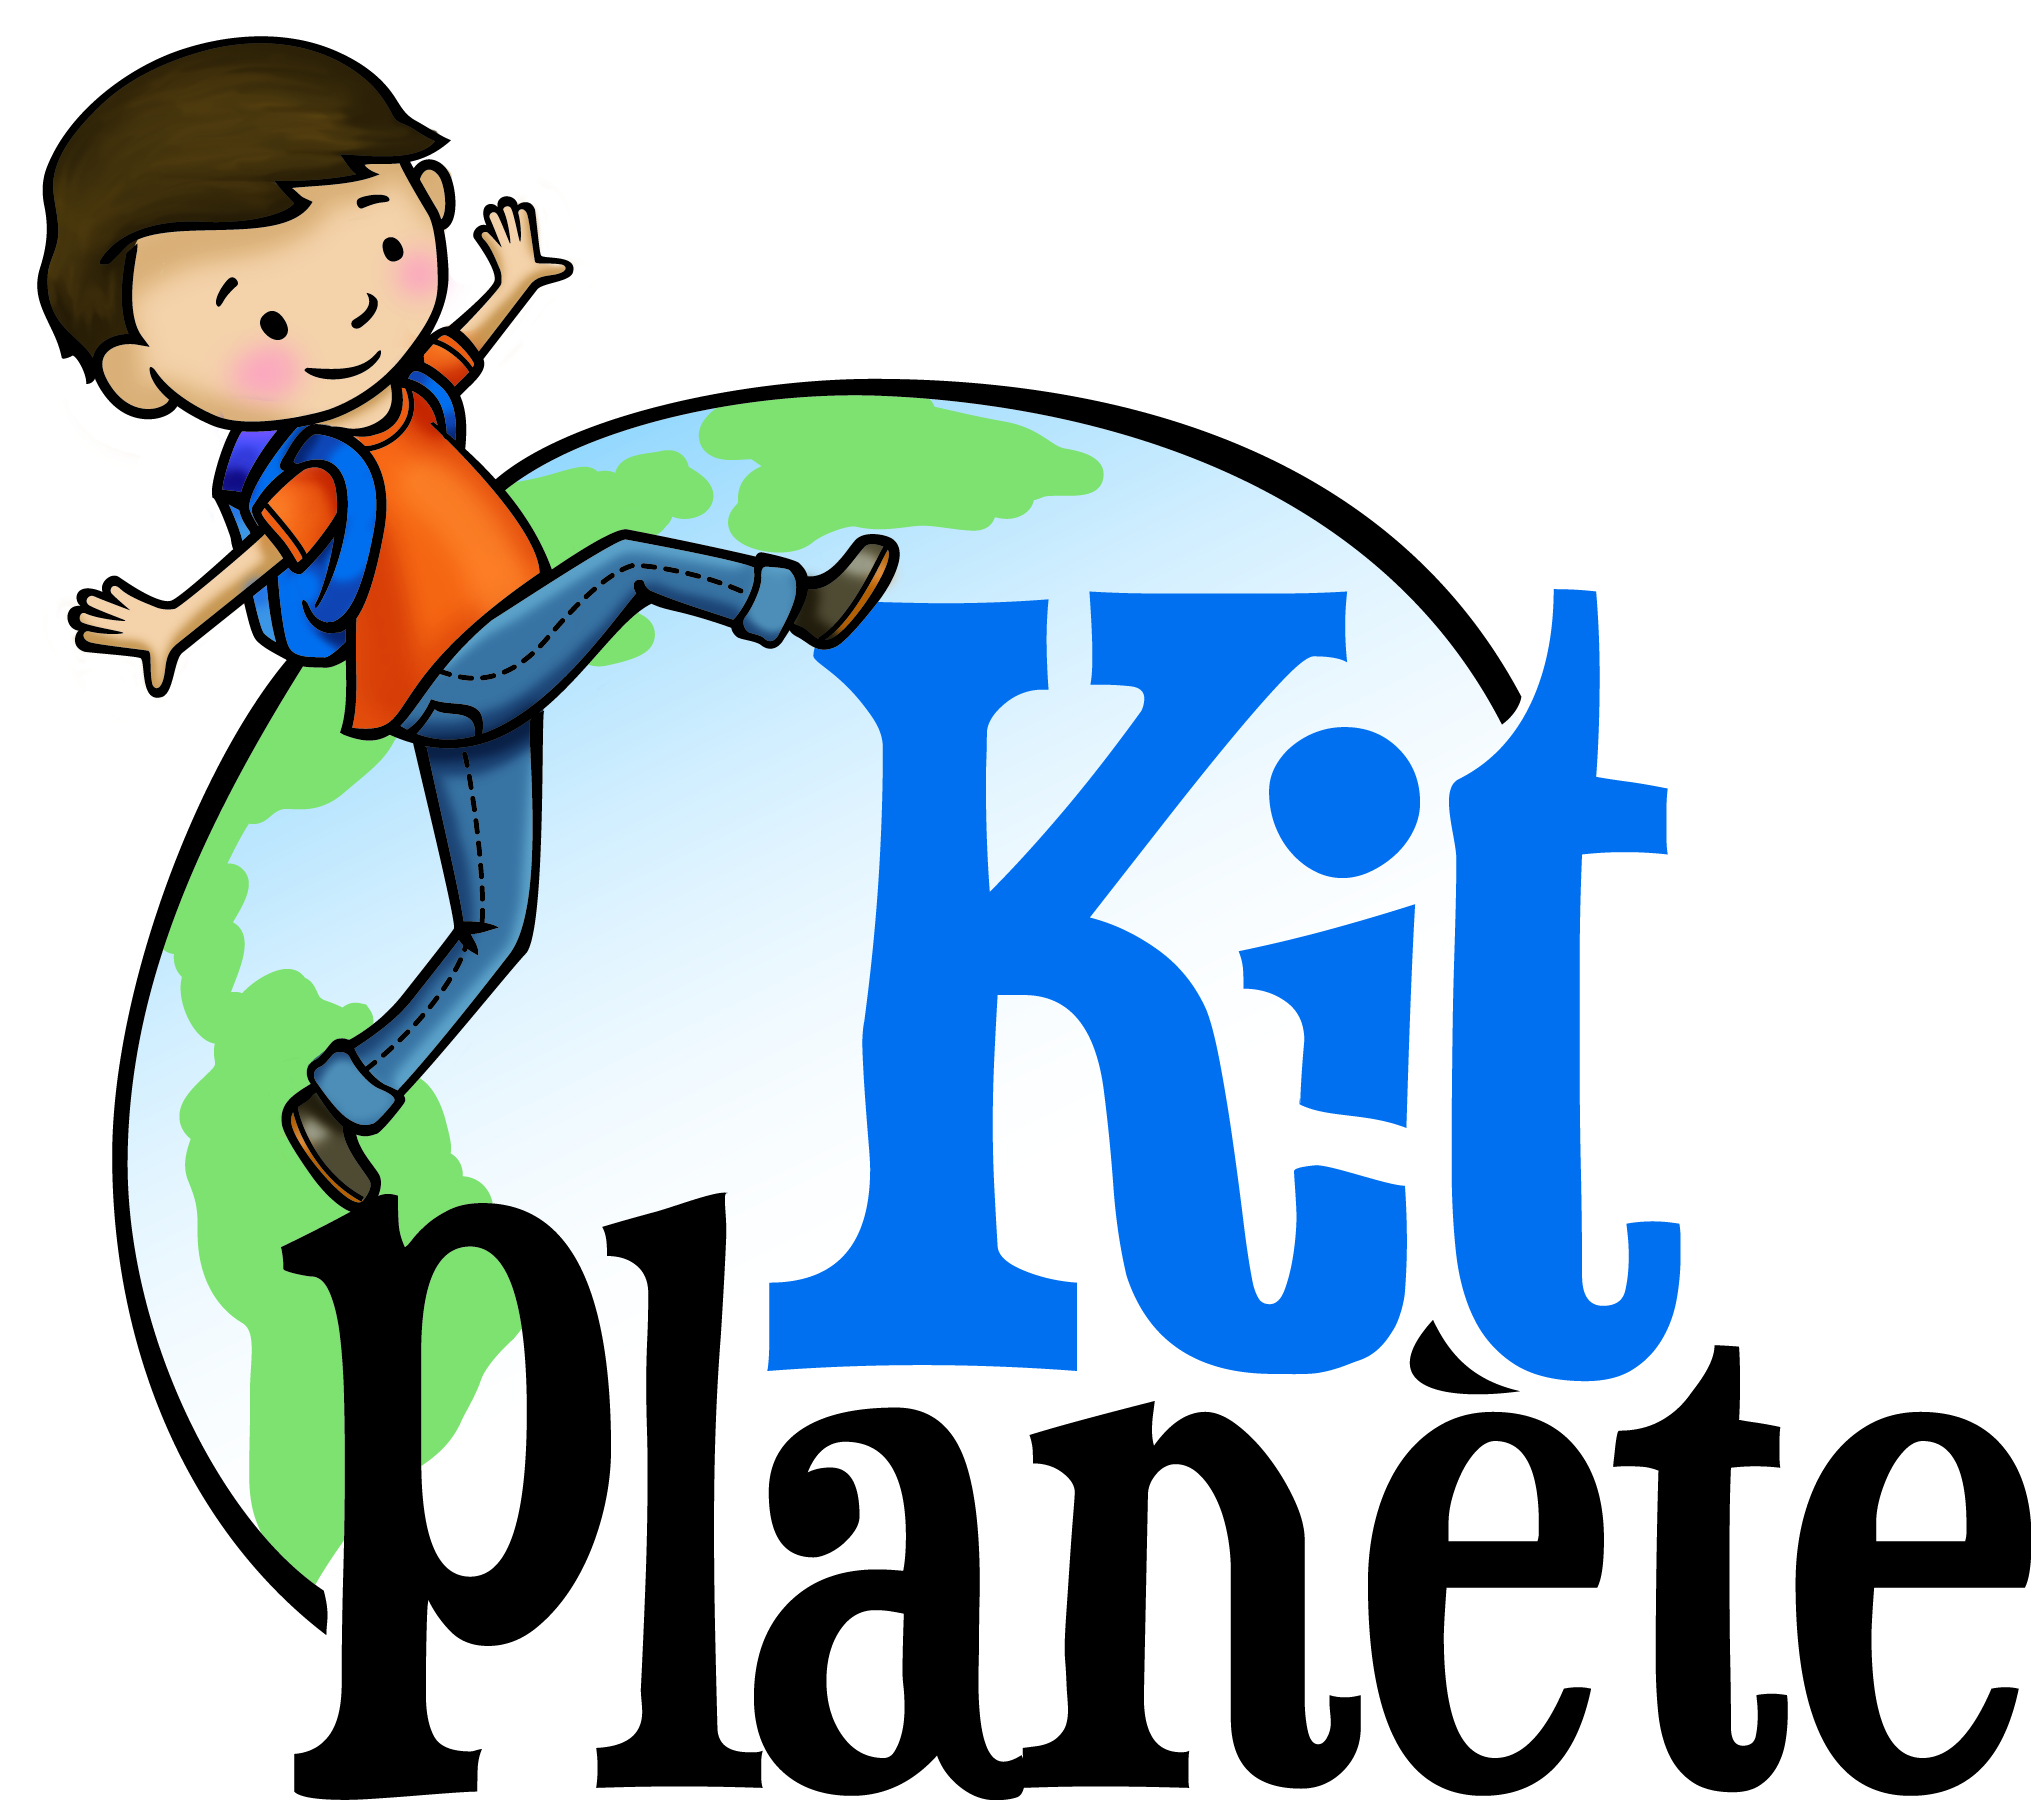 Kit Planete patenaire sosprof